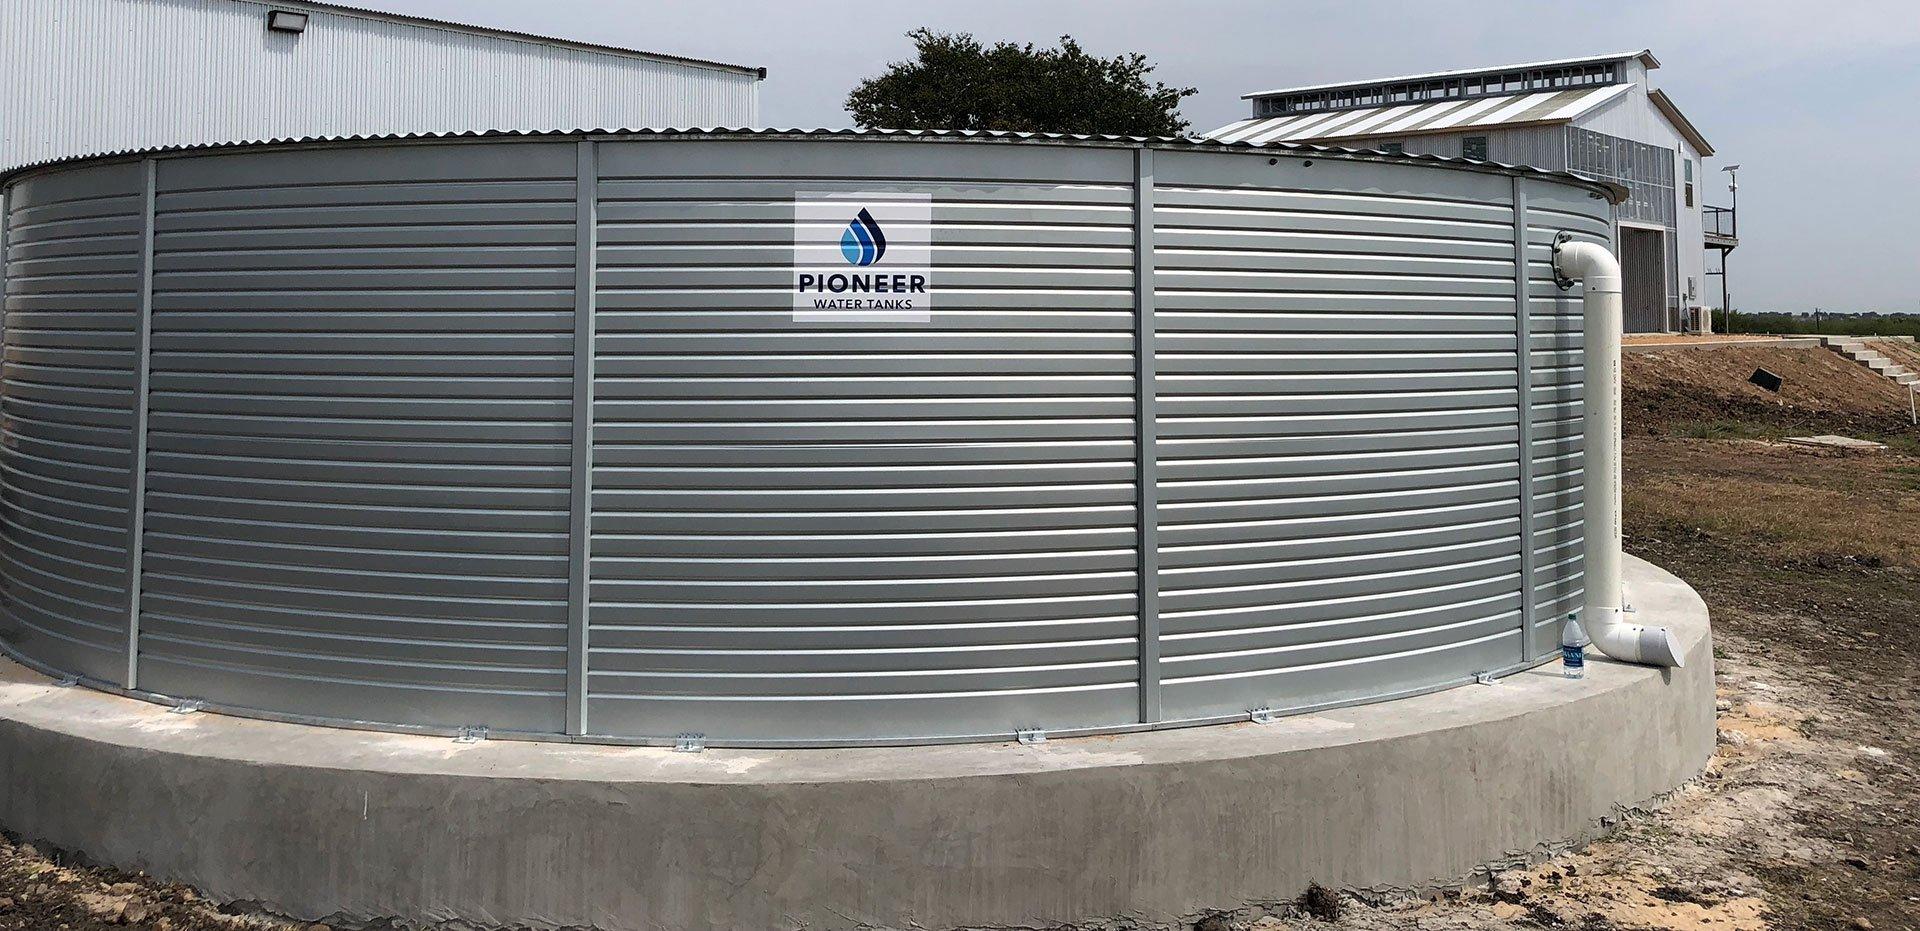 Lakota Tank Company rainwater system project